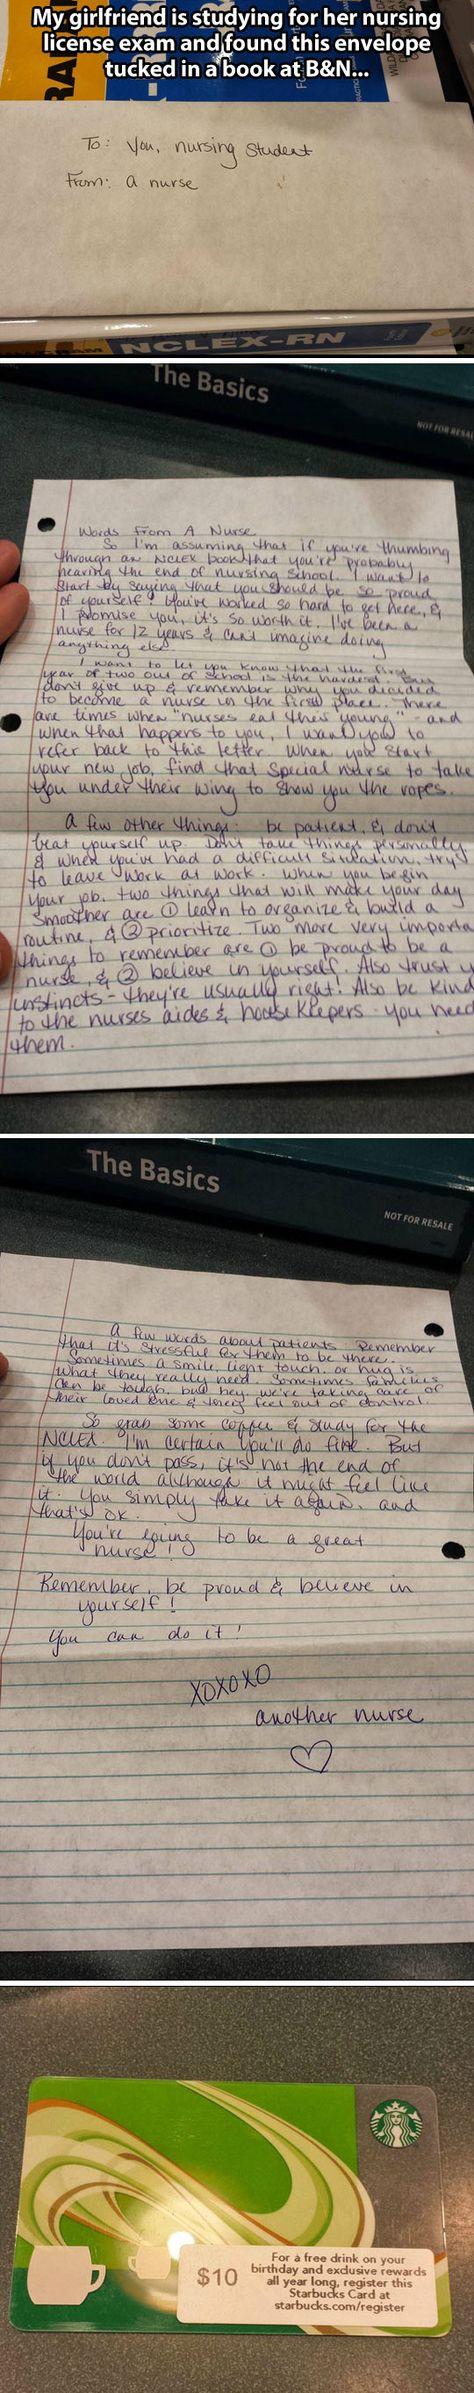 letter resignation rn%0A     best Life of a Nurse  The humor  images on Pinterest   Nurses  Nursing  and Nursing schools